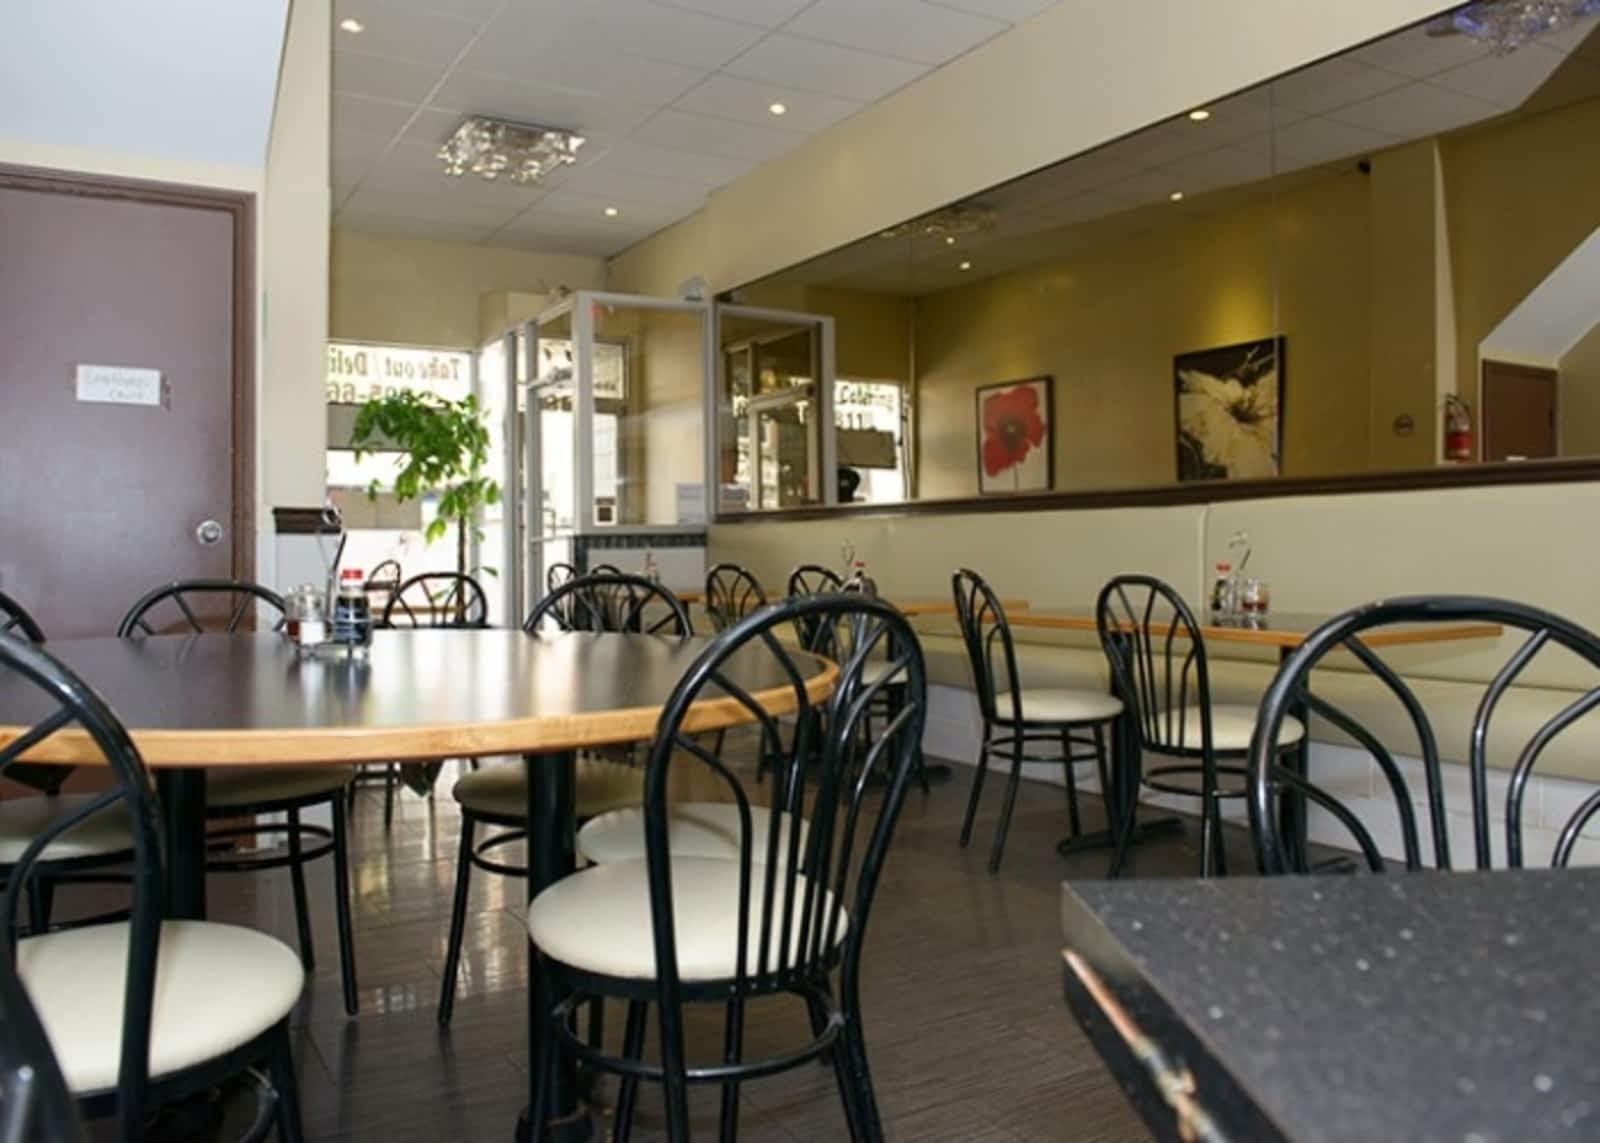 Sams kitchen ltd menu hours prices 114 brock st s whitby on